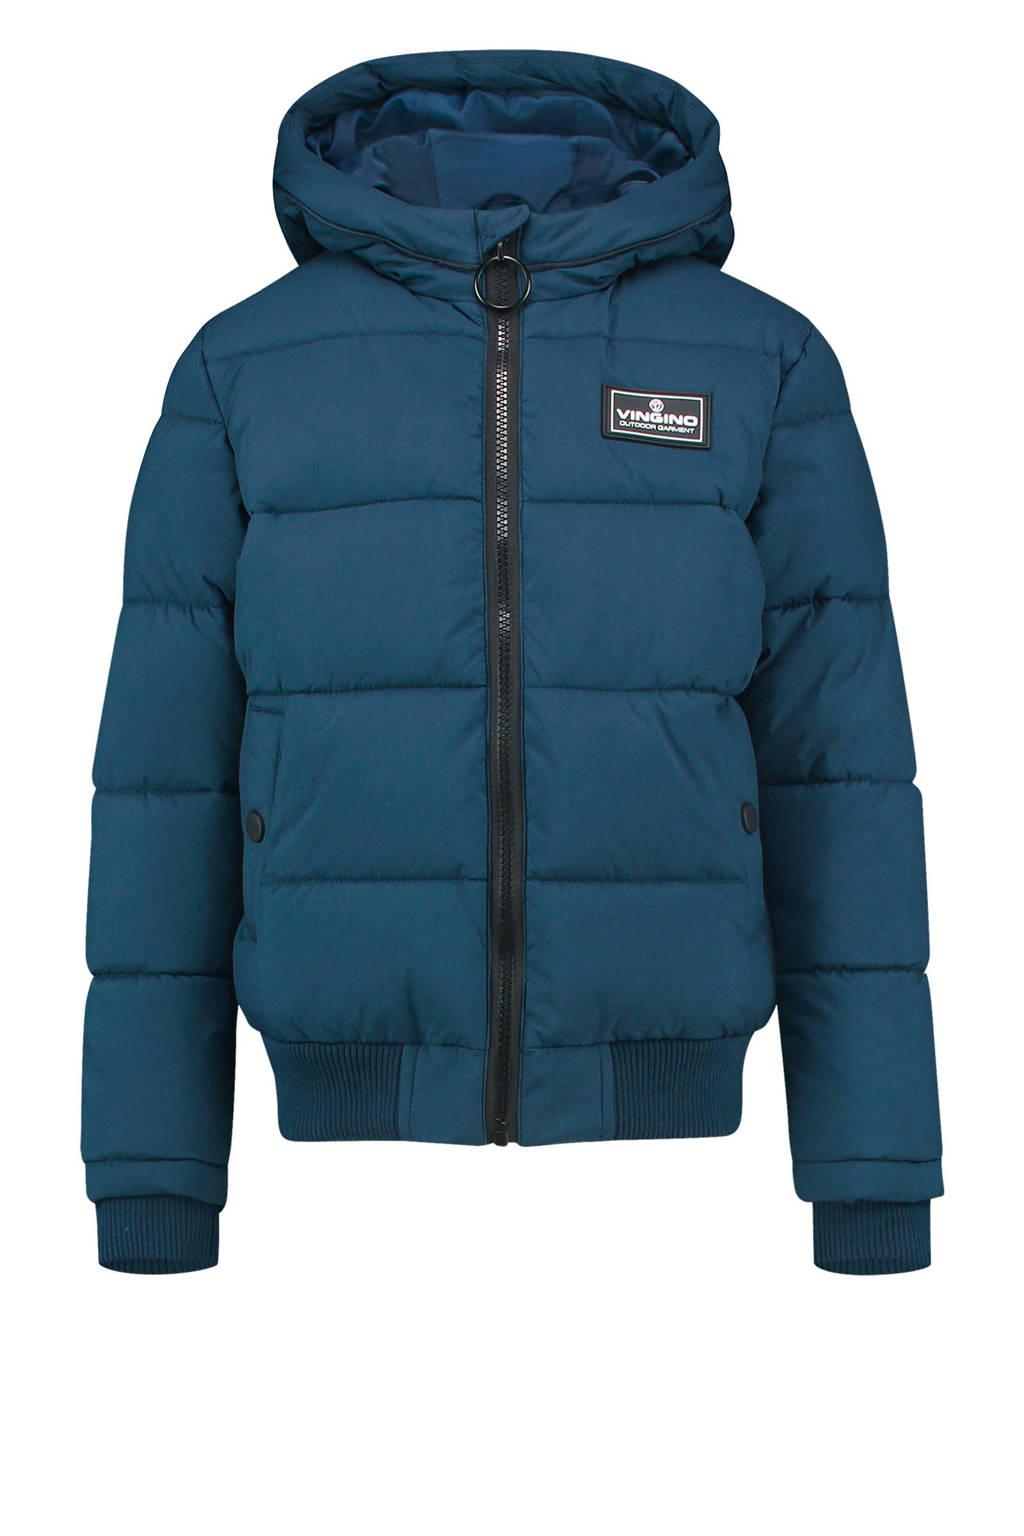 Vingino gewatteerde winterjas Tanju donkerblauw, Donkerblauw